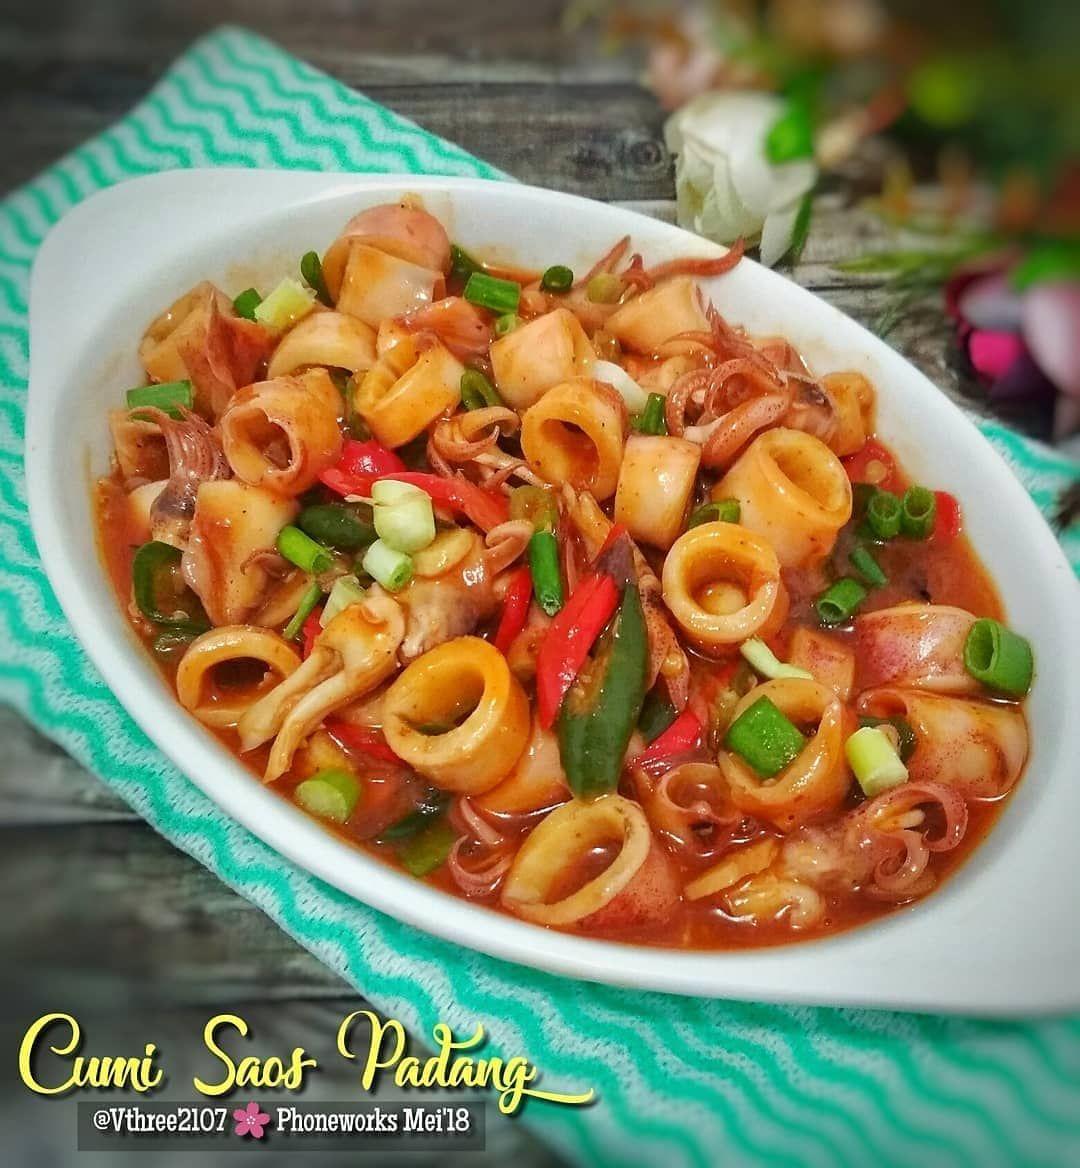 4 770 Likes 48 Comments Doyan Cooking Doyancooking On Instagram Cumi Saos Padang By Vthree2107 Baha Resep Makanan Resep Masakan Resep Seafood